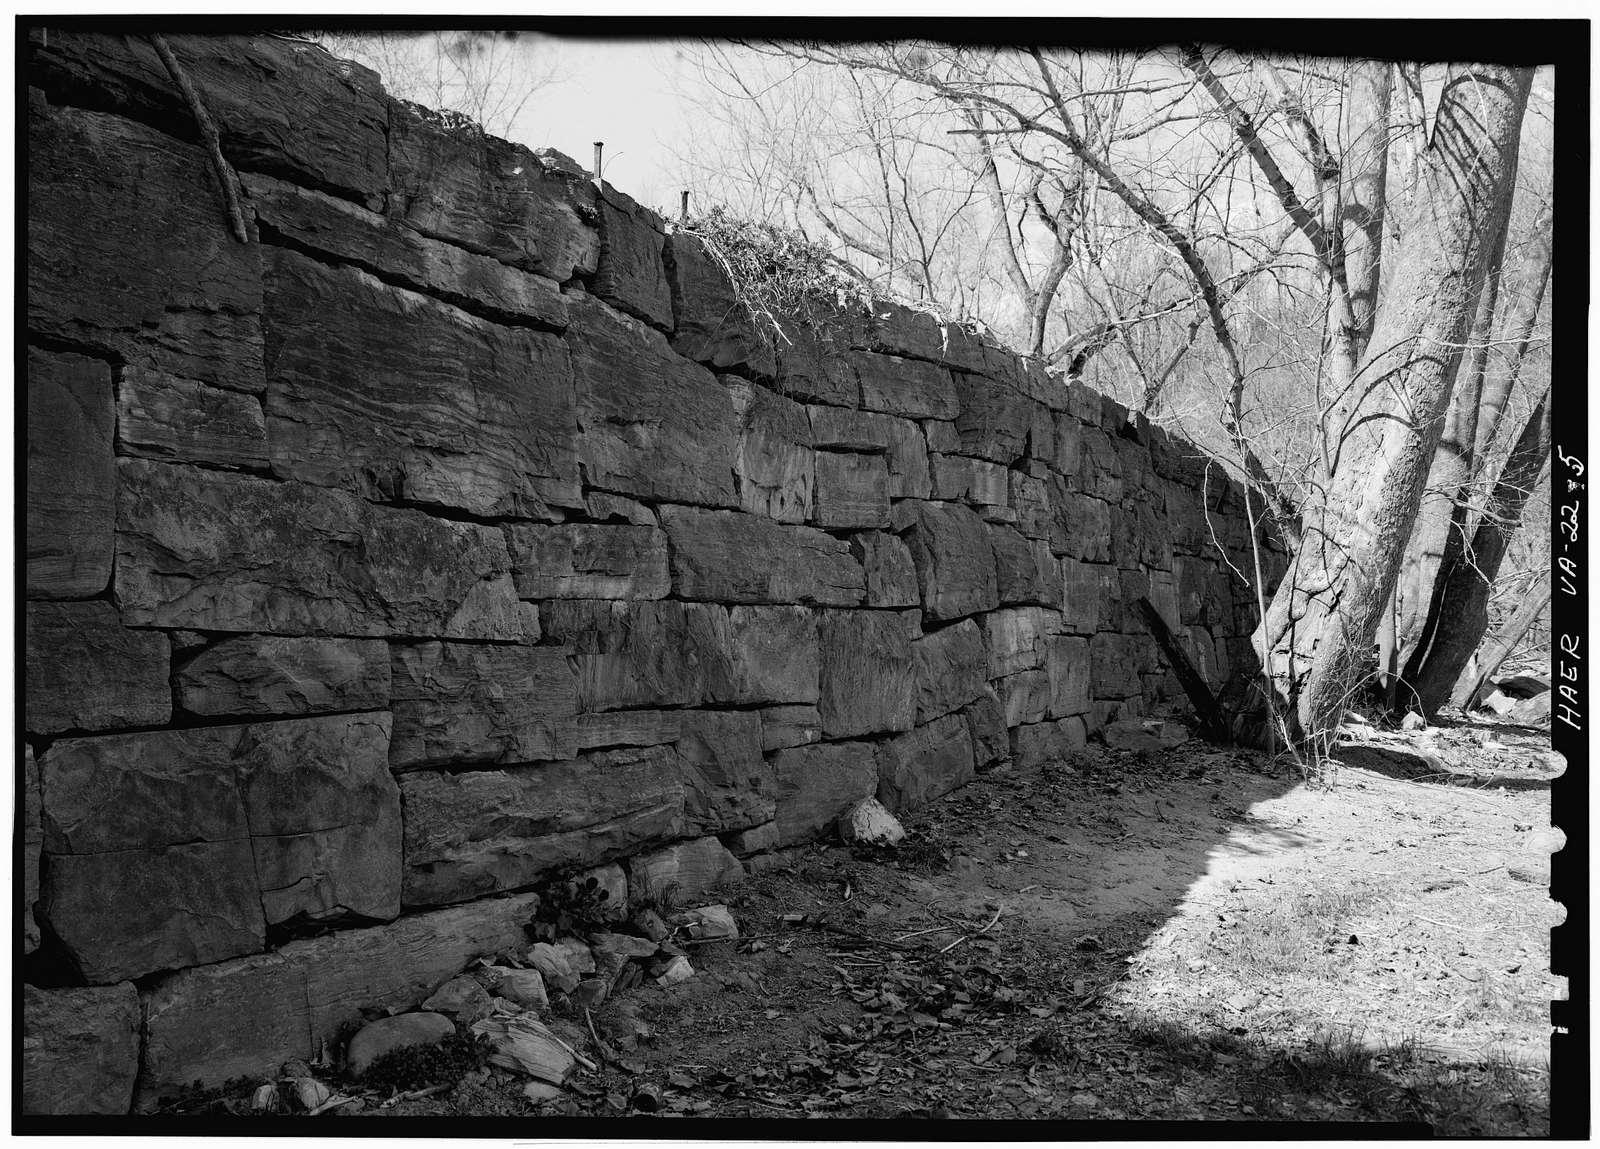 James River & Kanawha Canal, South River Dam & Lock, Maury River, Lexington, Lexington, VA